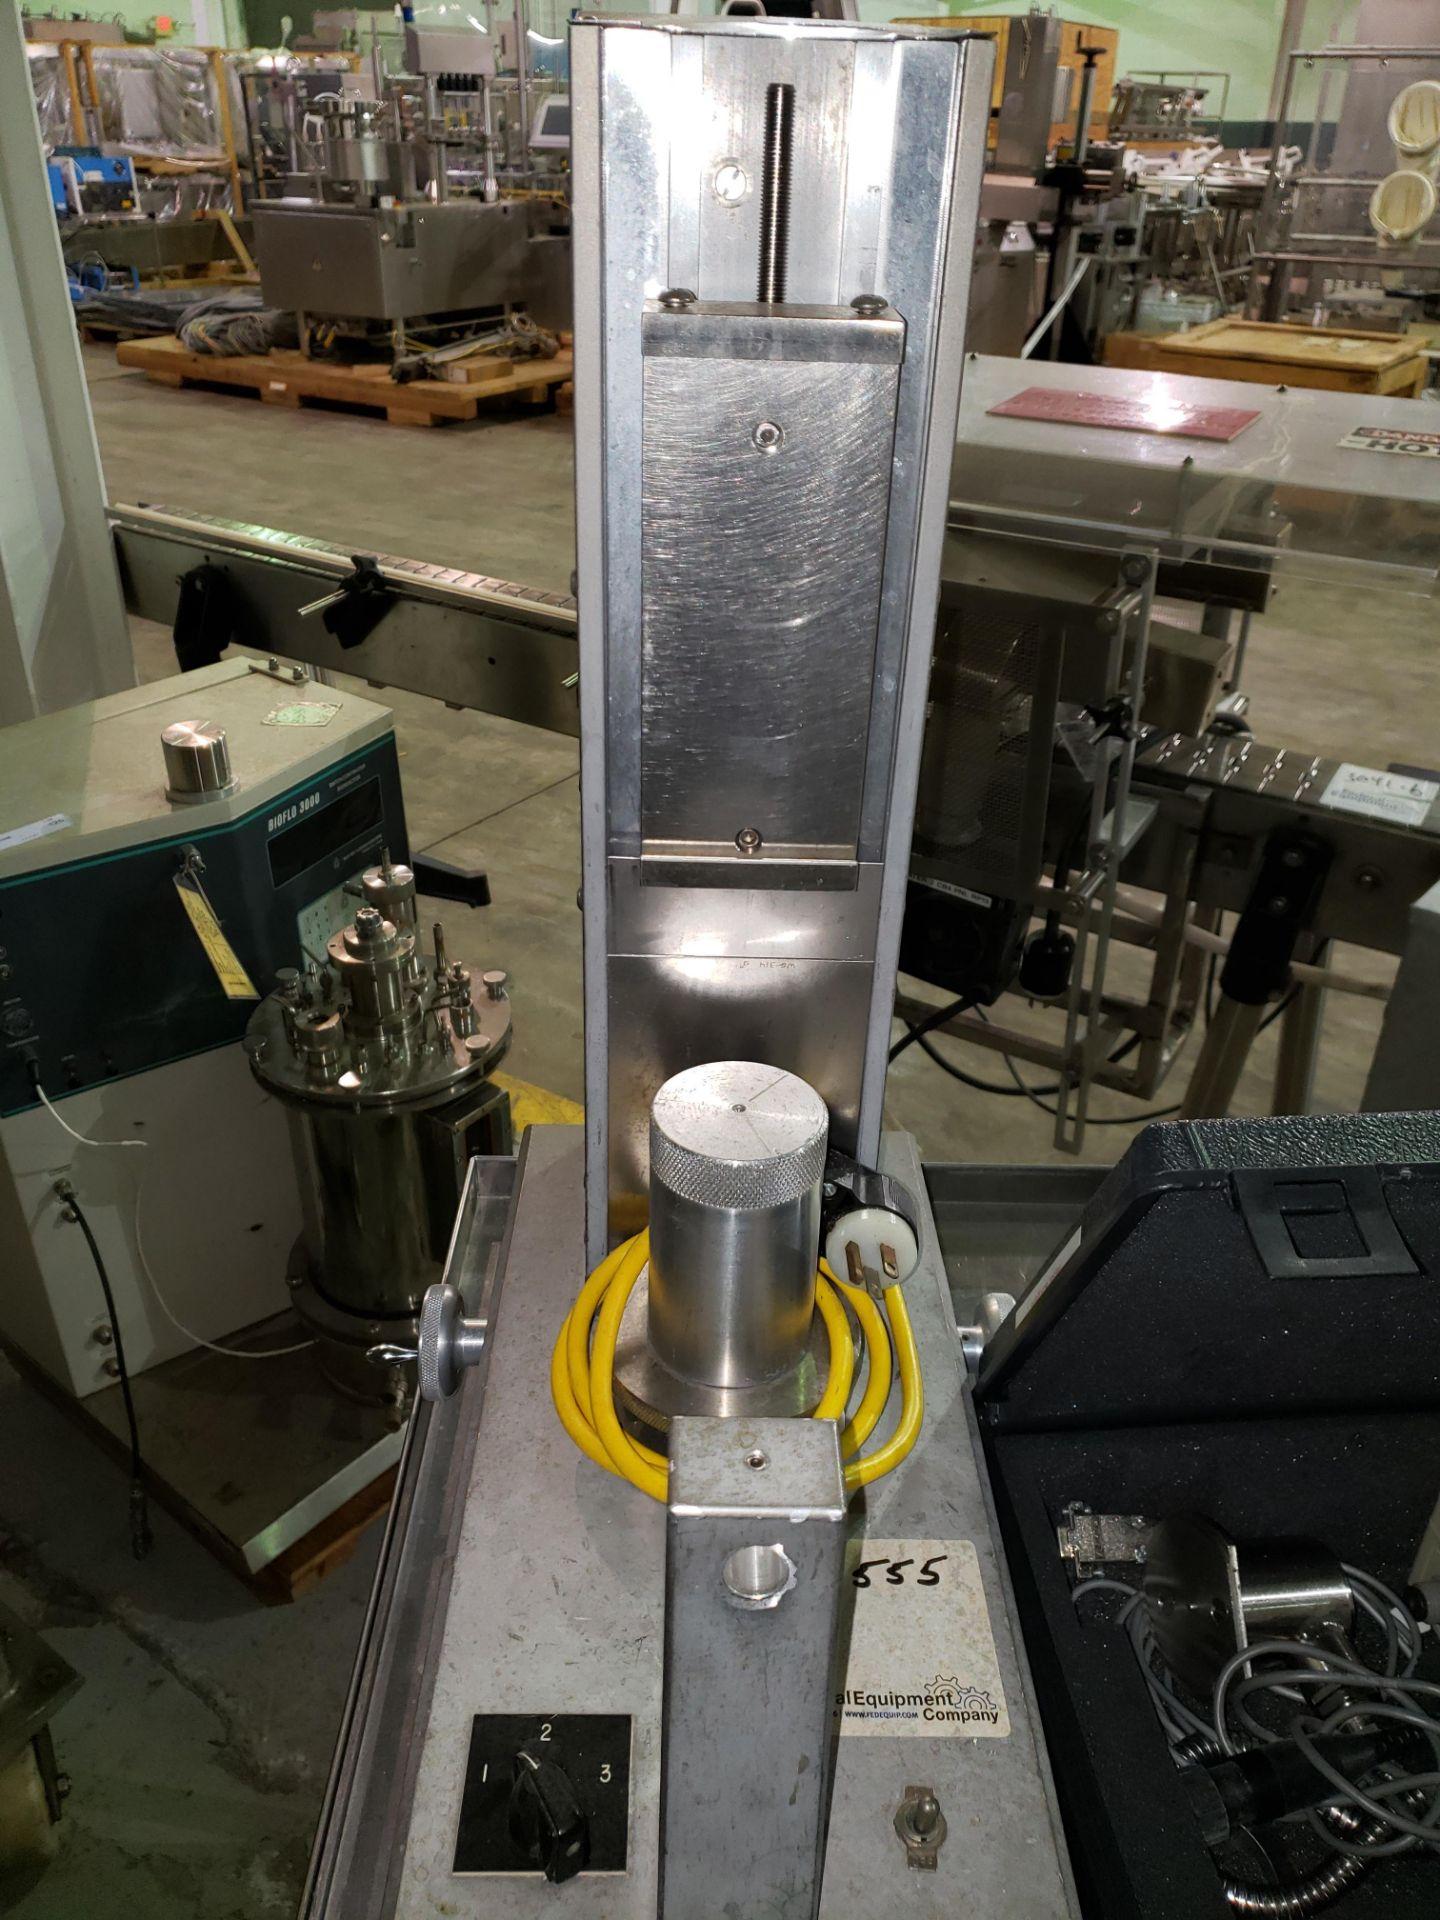 Lot 4 - West seal force tester, model WG005, serial# 088.